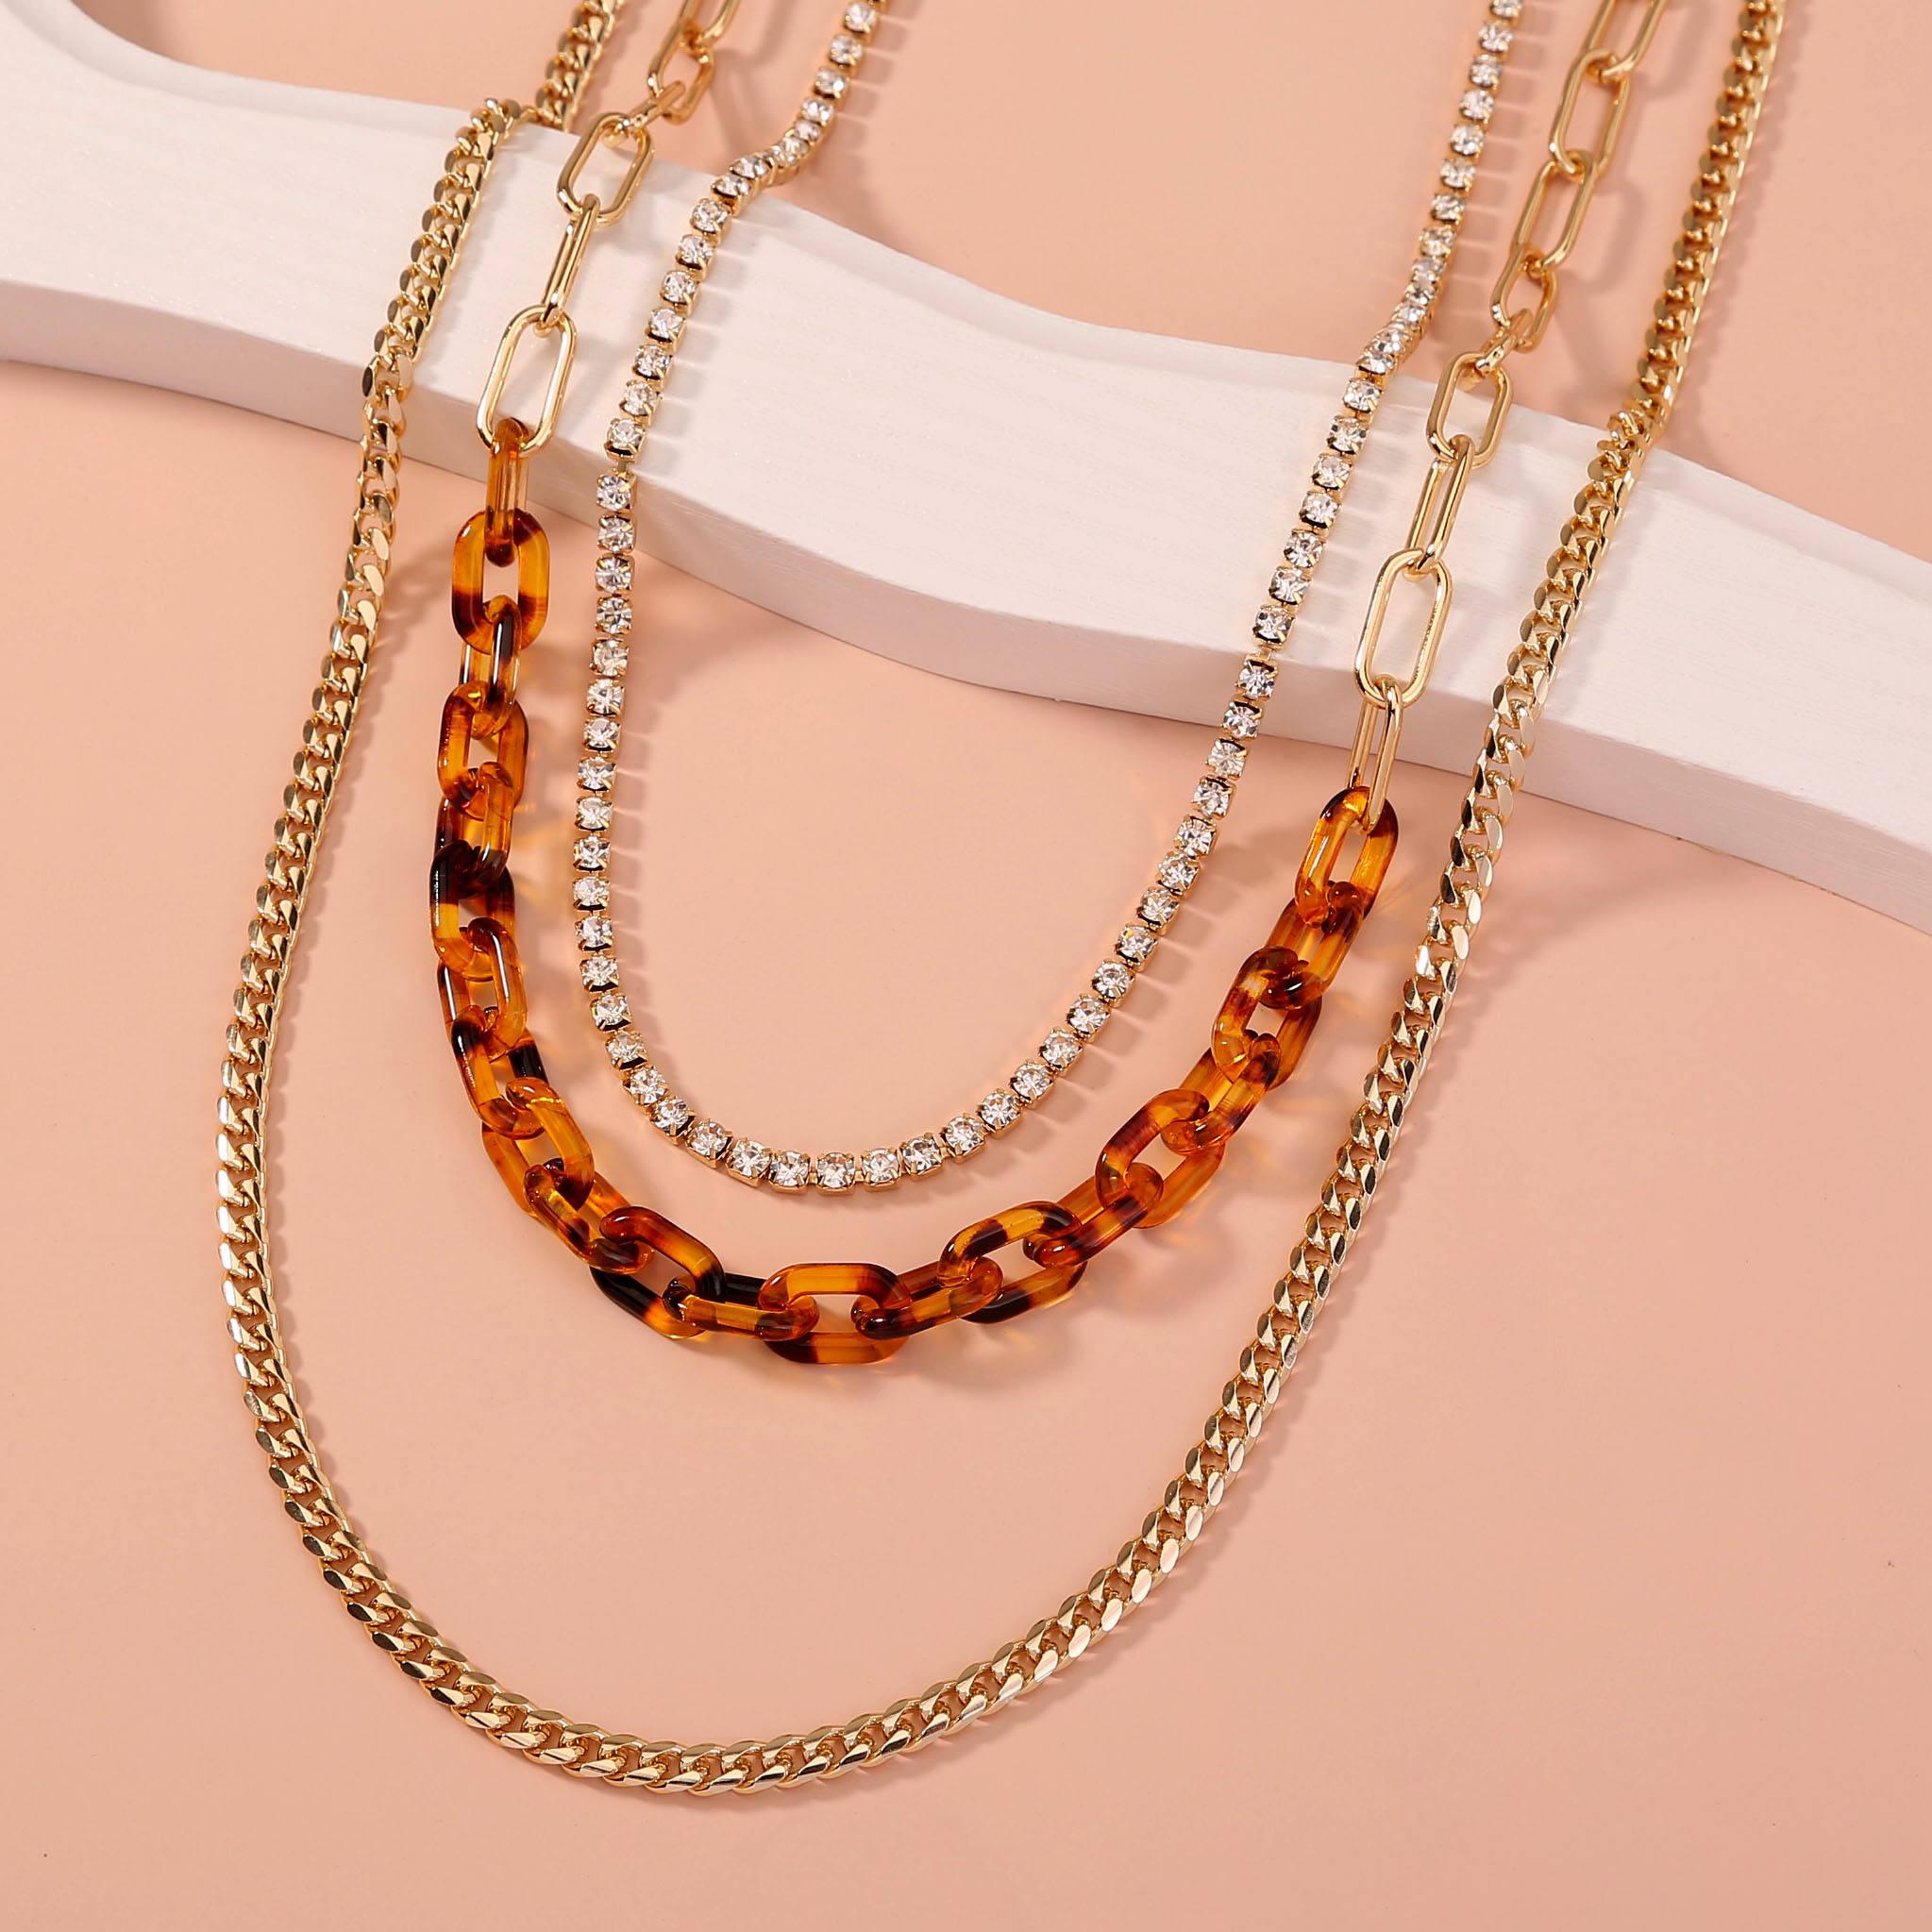 Women/'s necklace minimalist botanical chain silver steel pendant resin UV square diamond flowers real multicolored